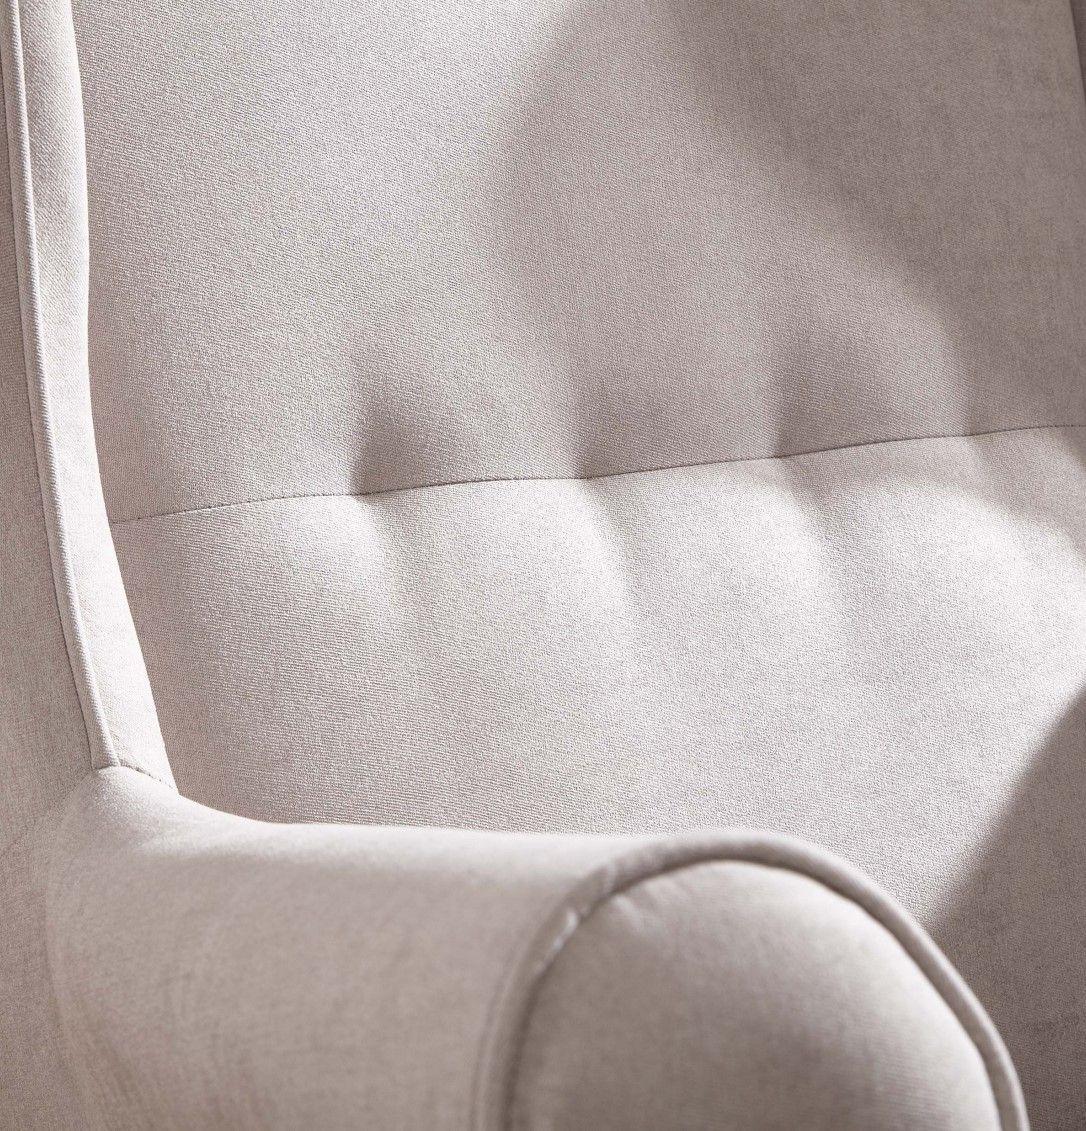 Wohnzimmer Sitzsack Chacos In Weiß Taupe: Sessel 86x83x91 Taupe SCANDI #110